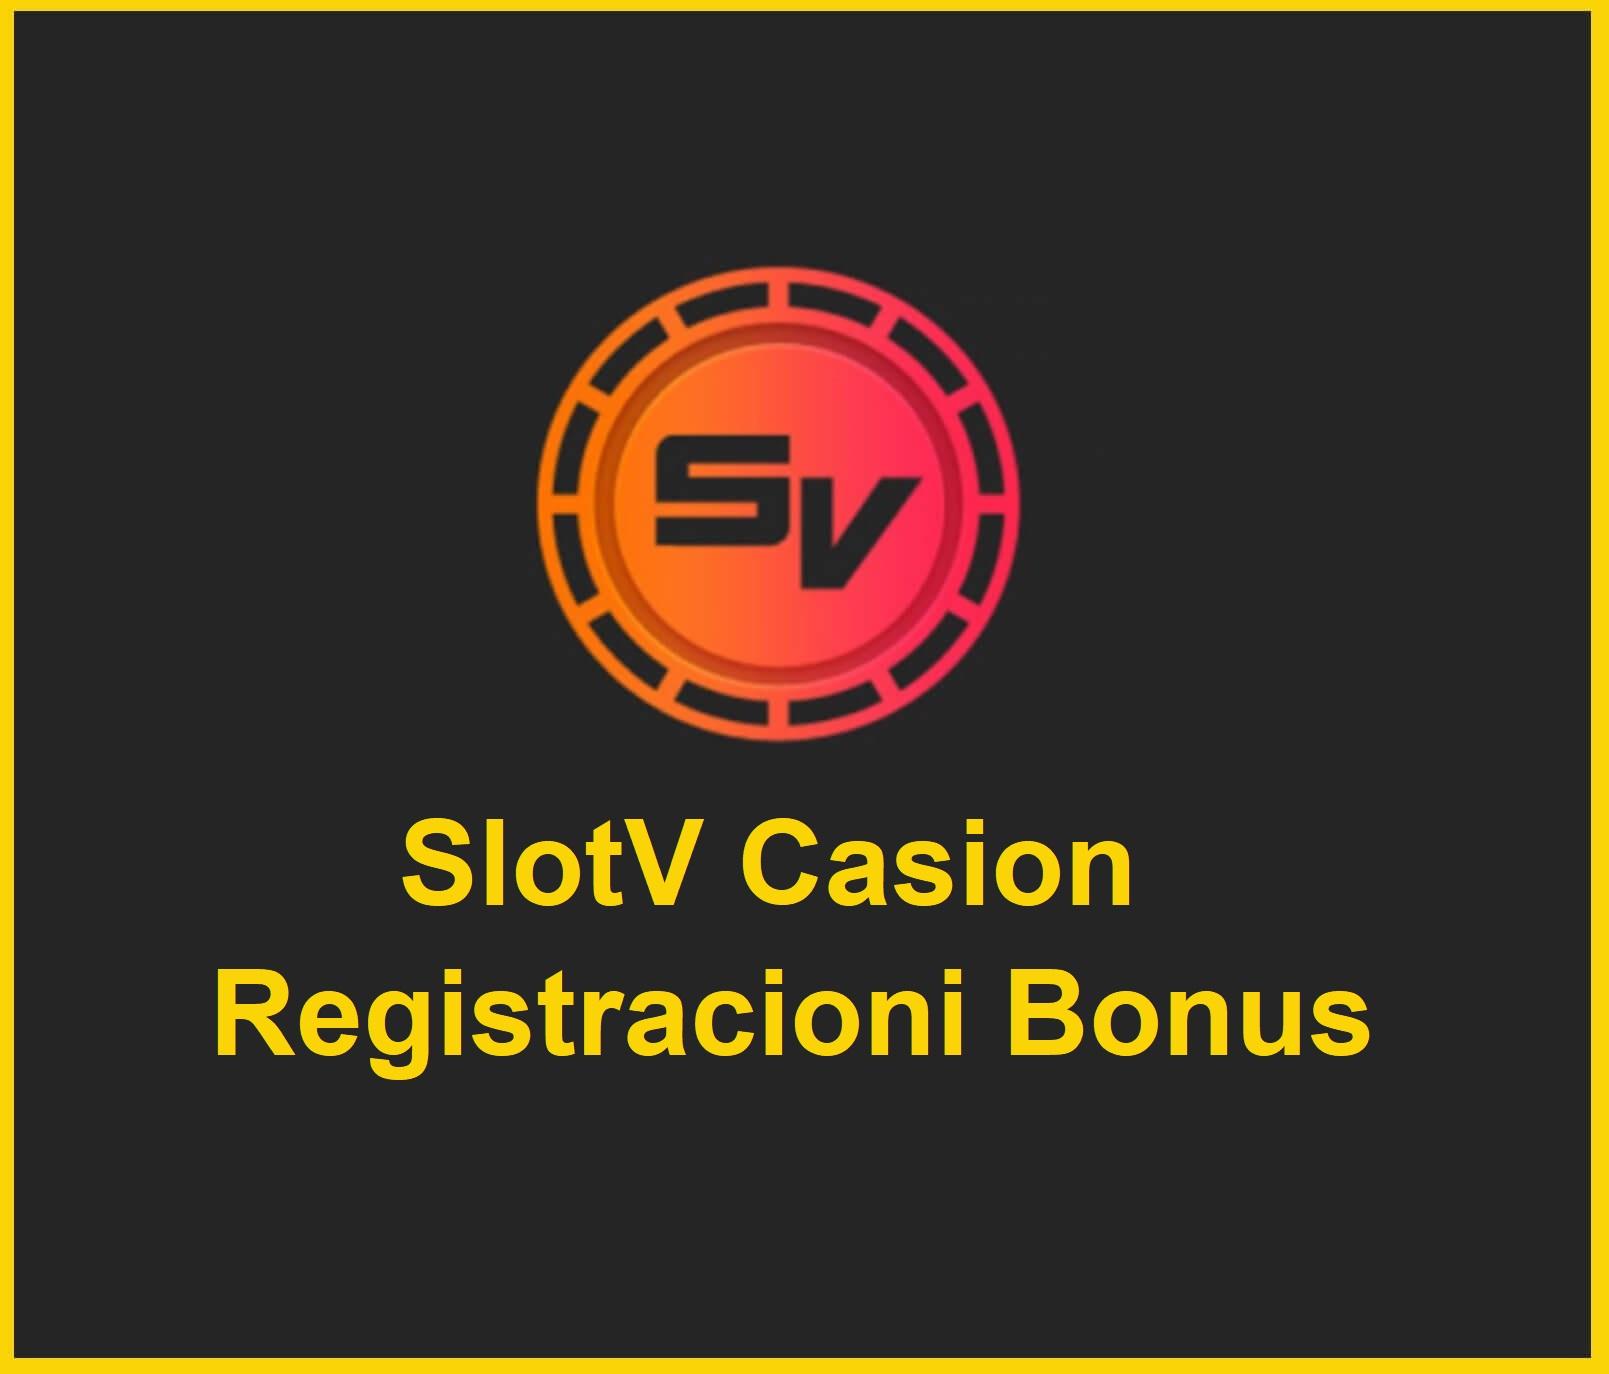 SlotV casion registracioni